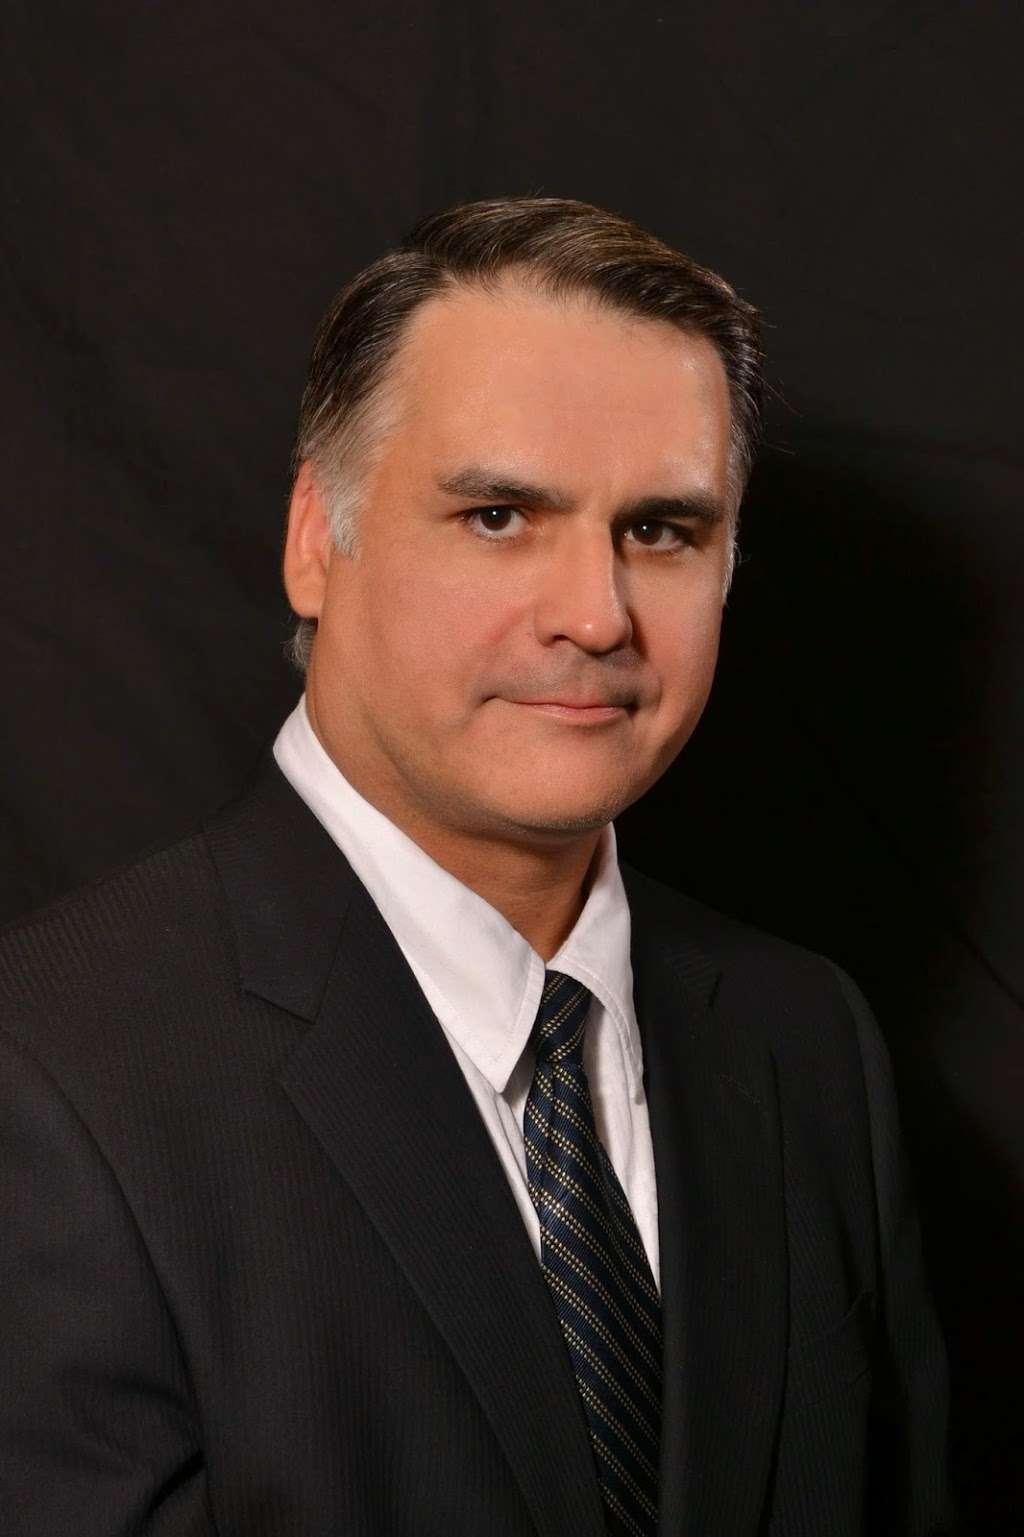 Thunderbird Internal Medicine - Summit Medical Group Arizona - doctor  | Photo 2 of 2 | Address: 9150 W Indian School Rd #118, Phoenix, AZ 85037, USA | Phone: (602) 938-6960